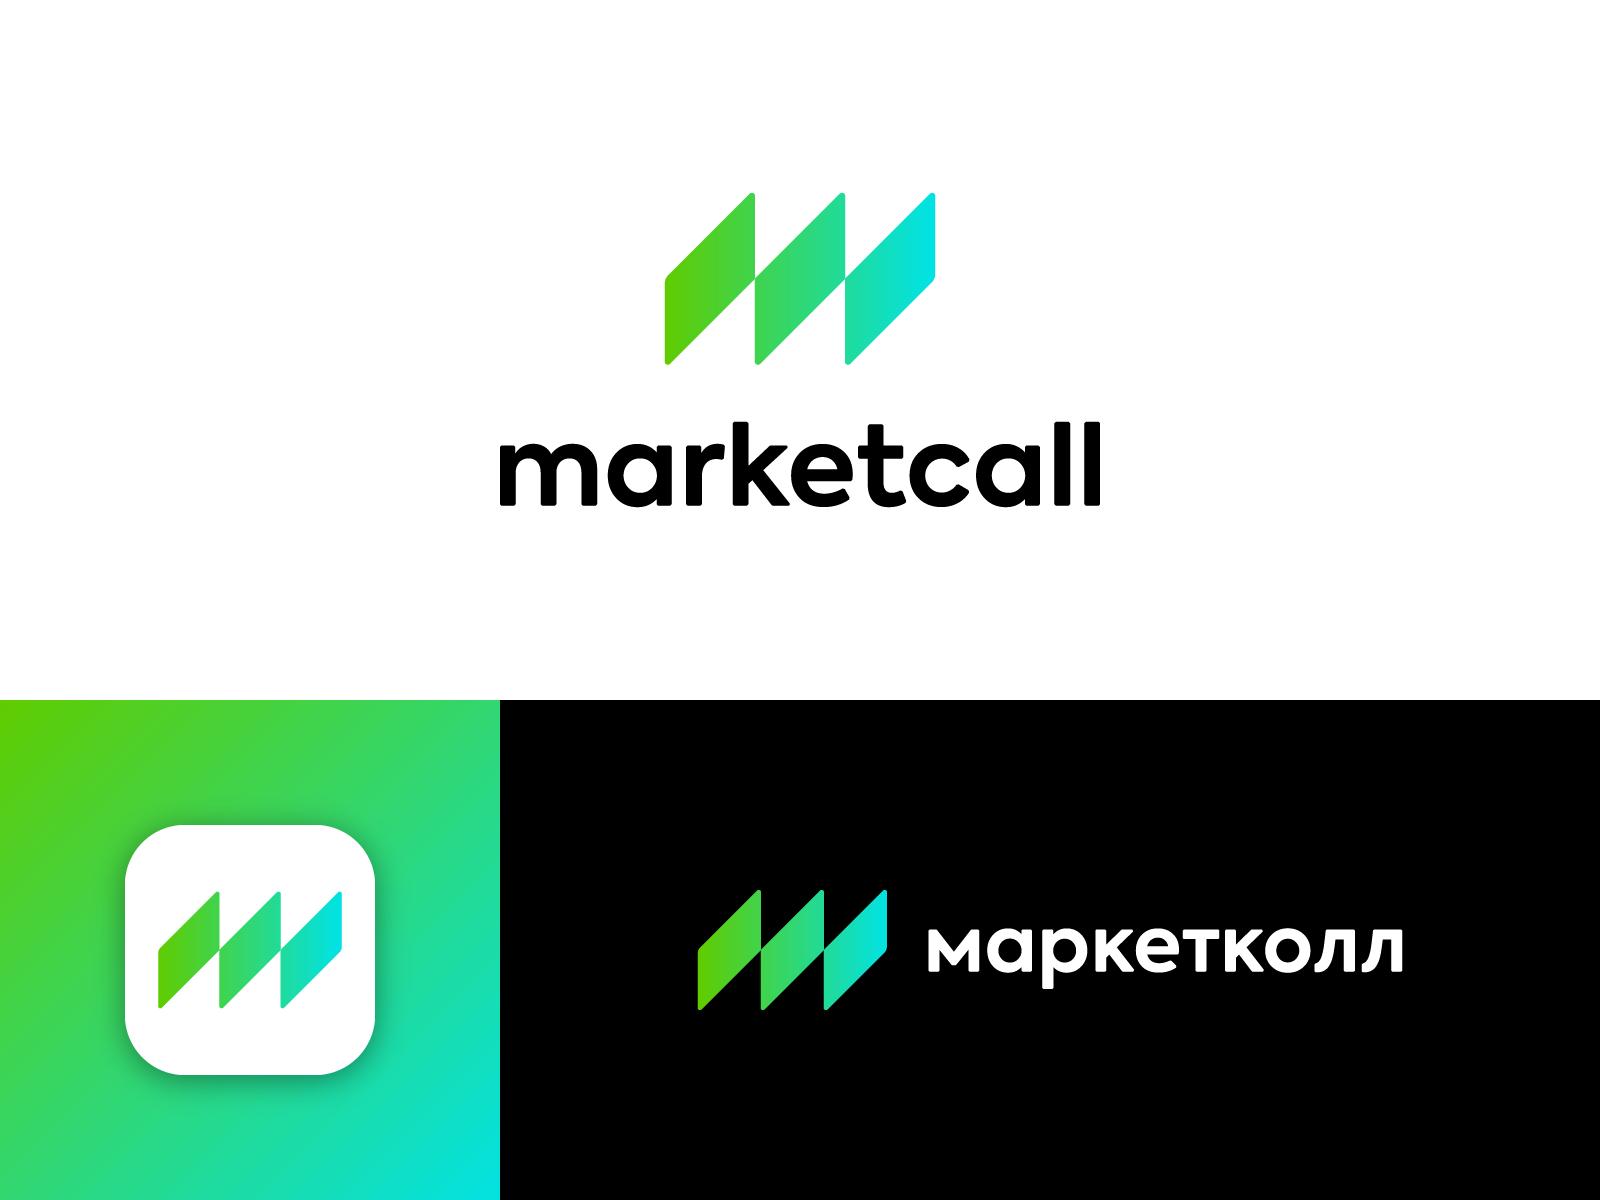 Marketcall message talk icon cyrillic connect call market branding logo m